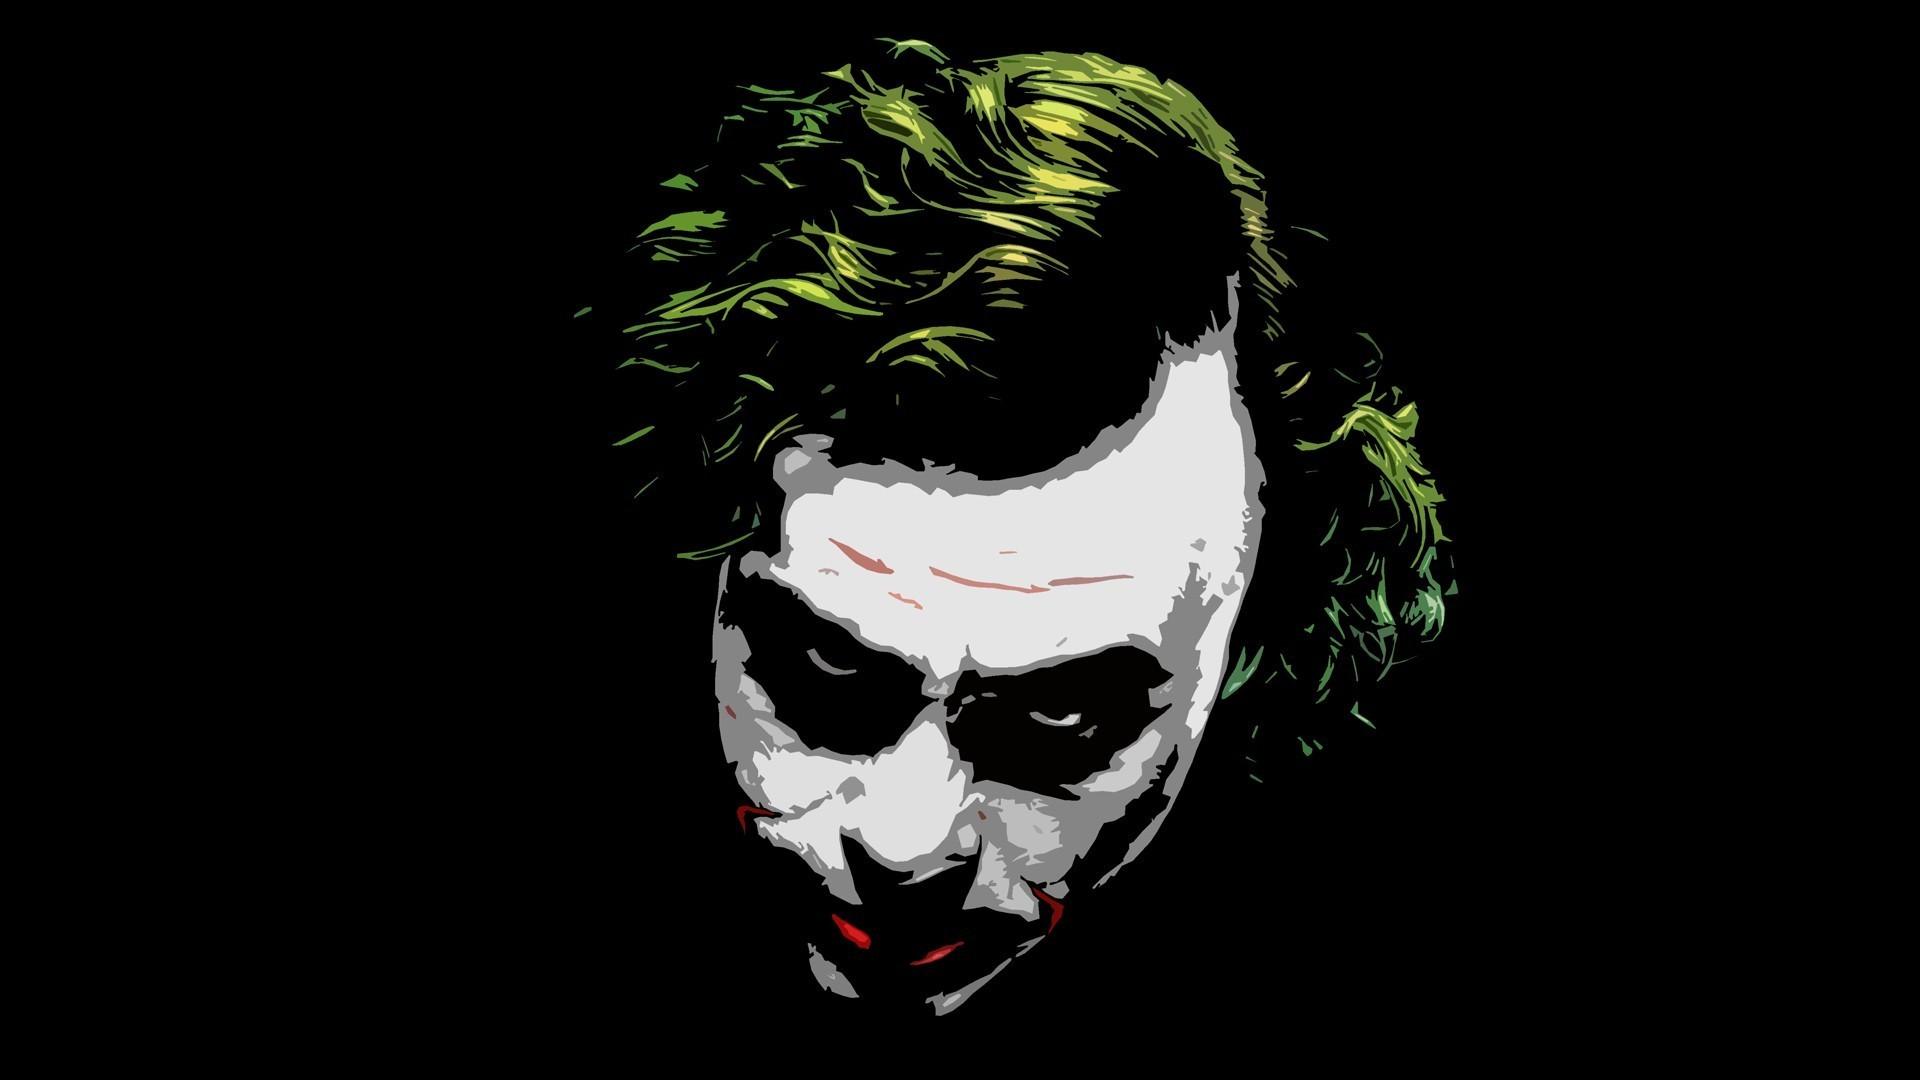 1920x1080 Movies Batman The Dark Knight Joker MessenjahMatt Wallpapers HD Desktop And Mobile Backgrounds